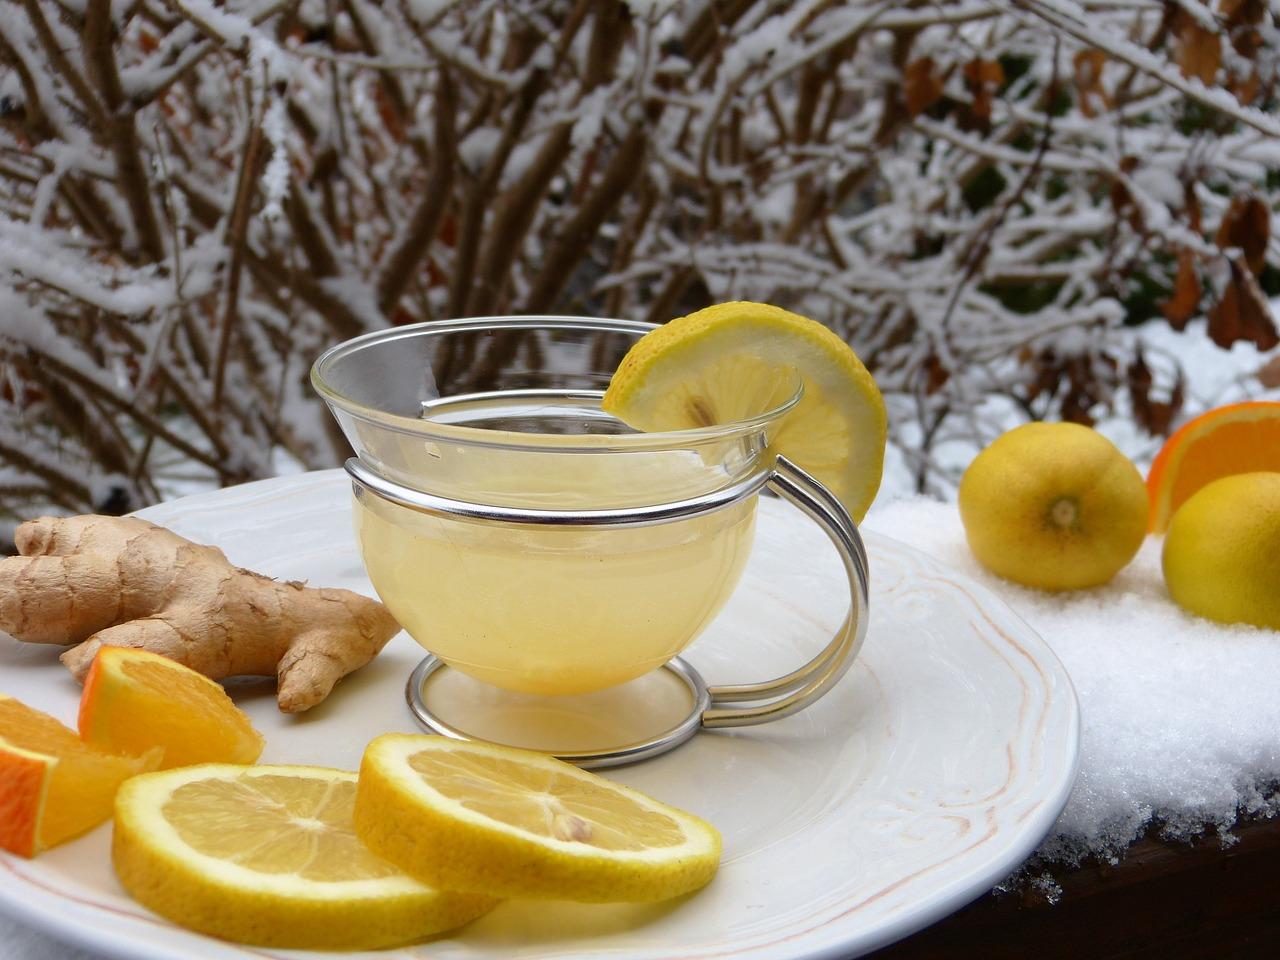 Ginger Benefits: ginger and lemon tea